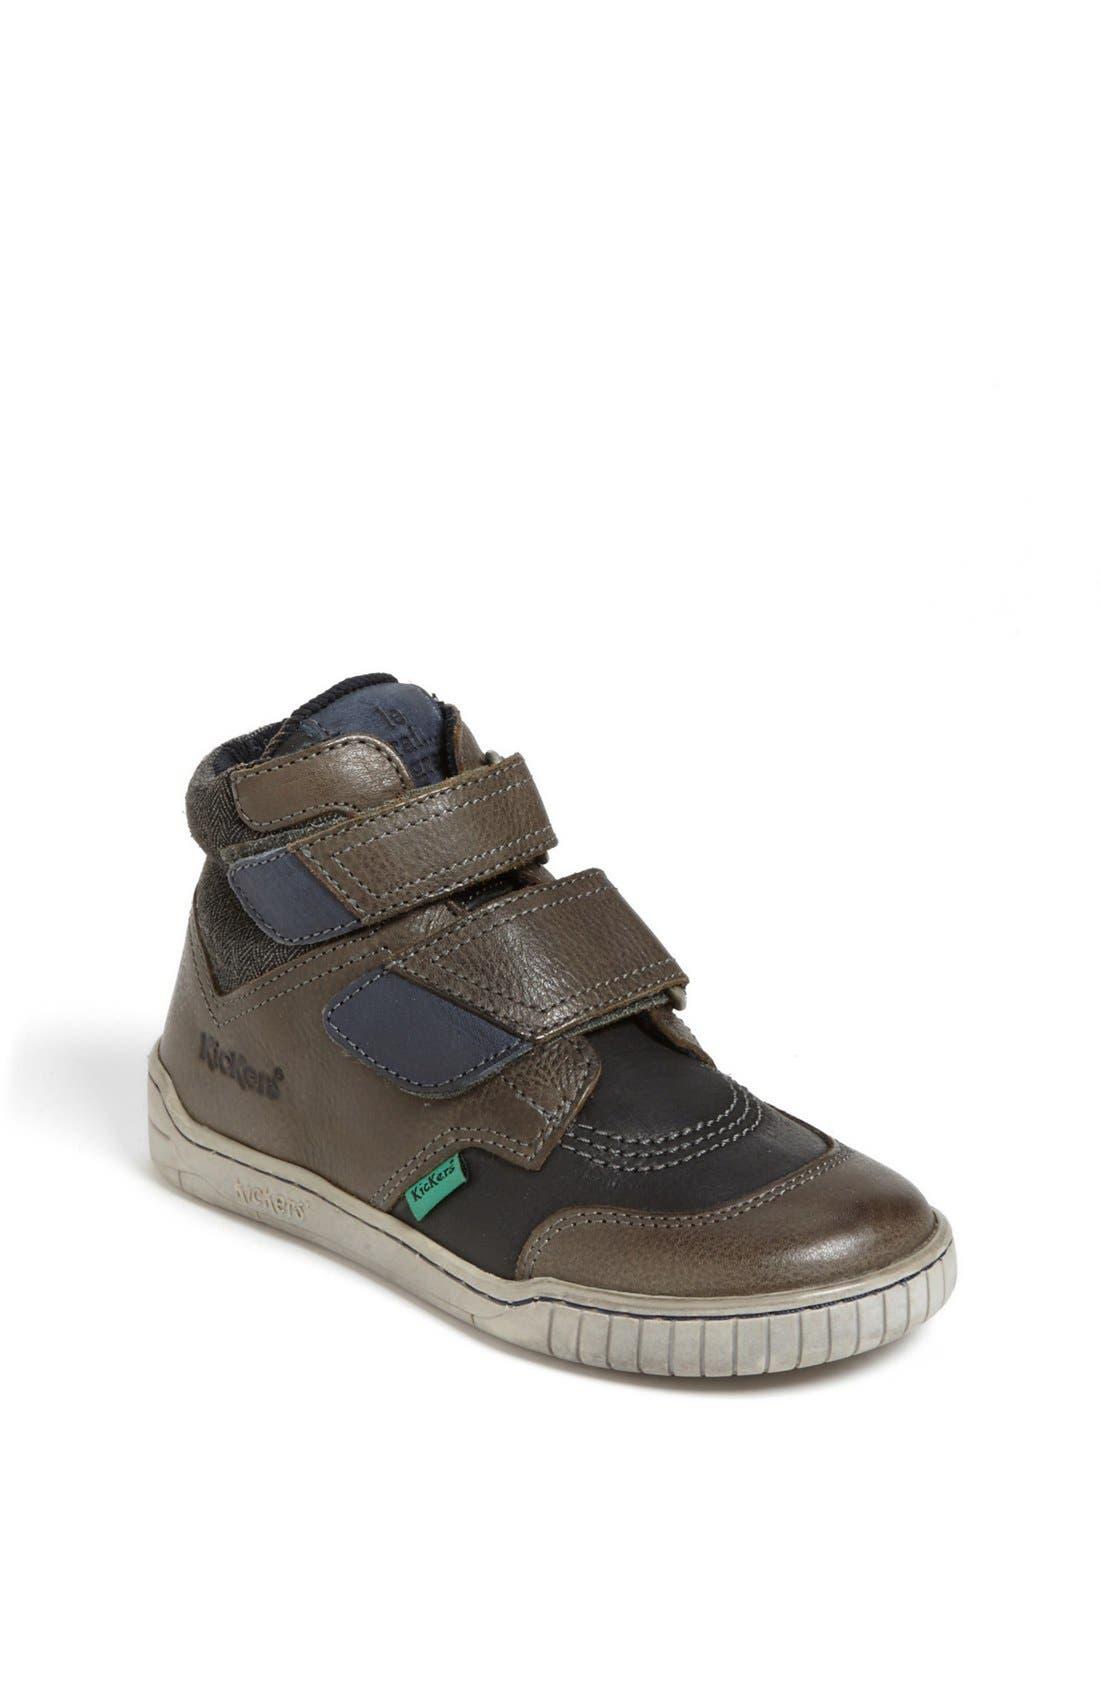 Main Image - Kickers 'Windsor 4' Sneaker (Toddler & Little Kid)